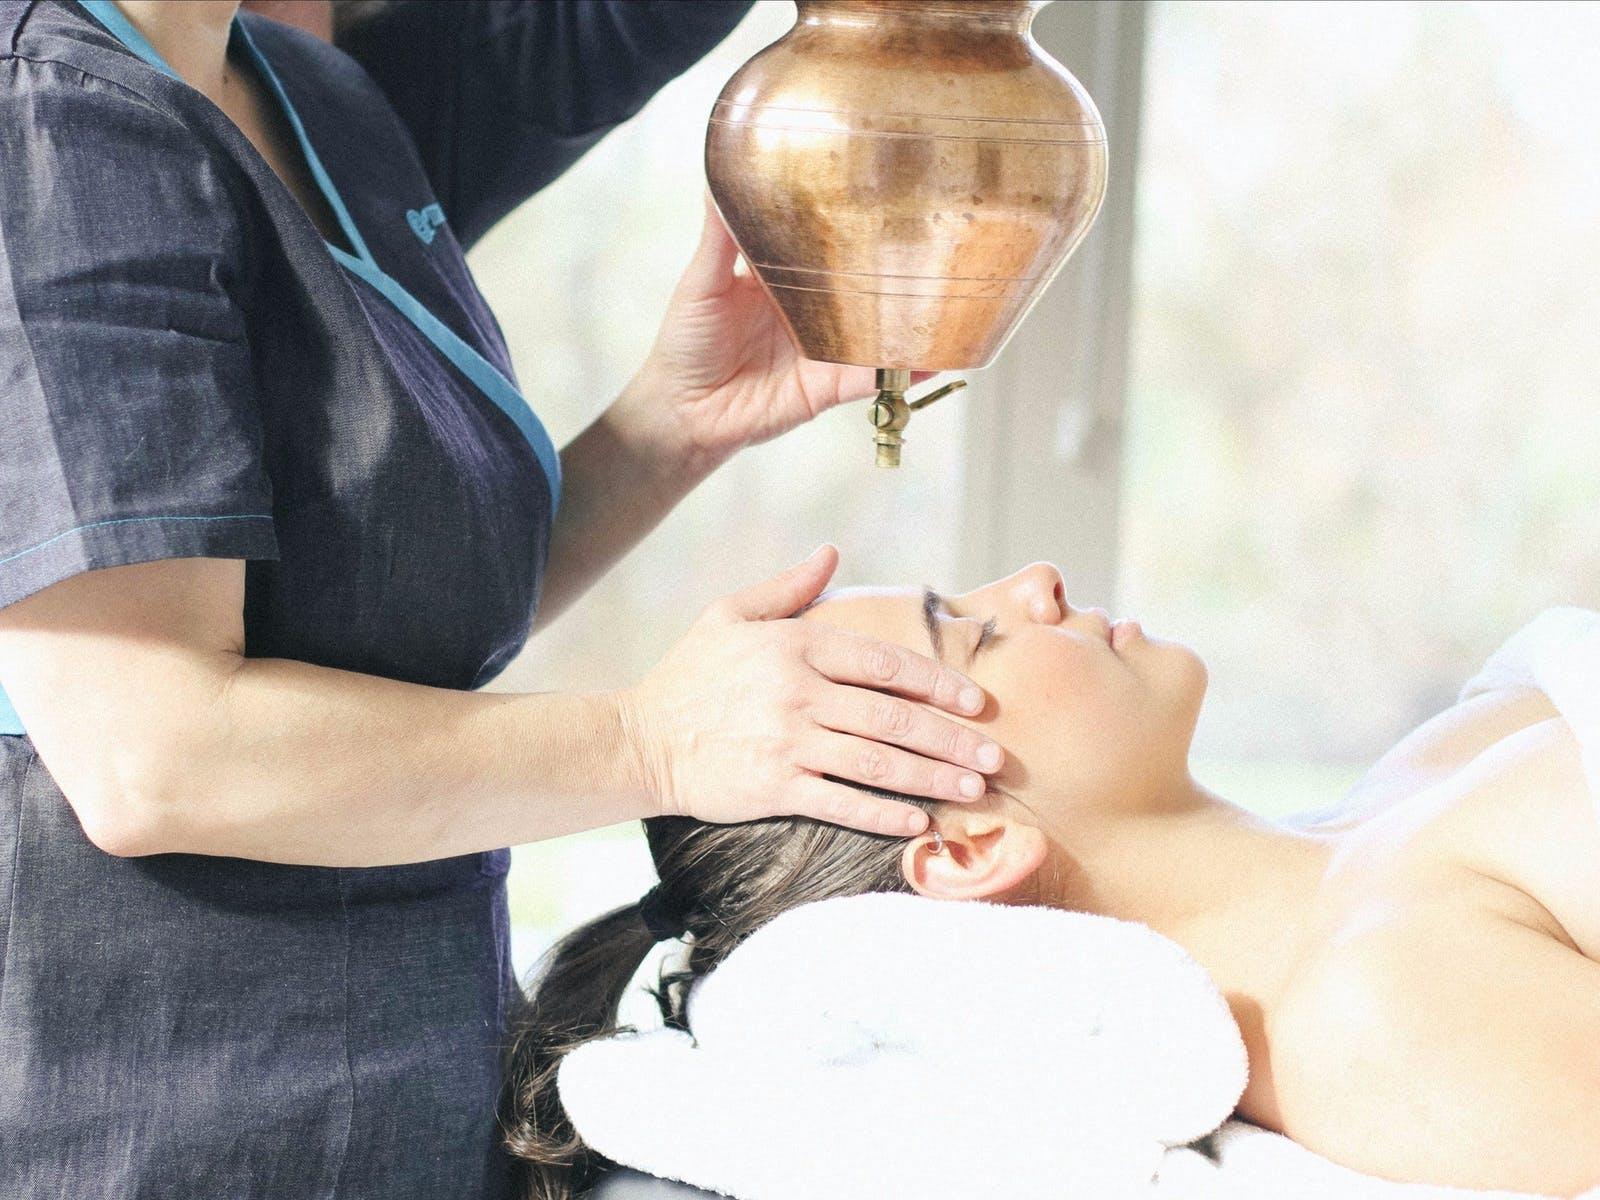 Maiaveda Holistic Health Retreat and Spa